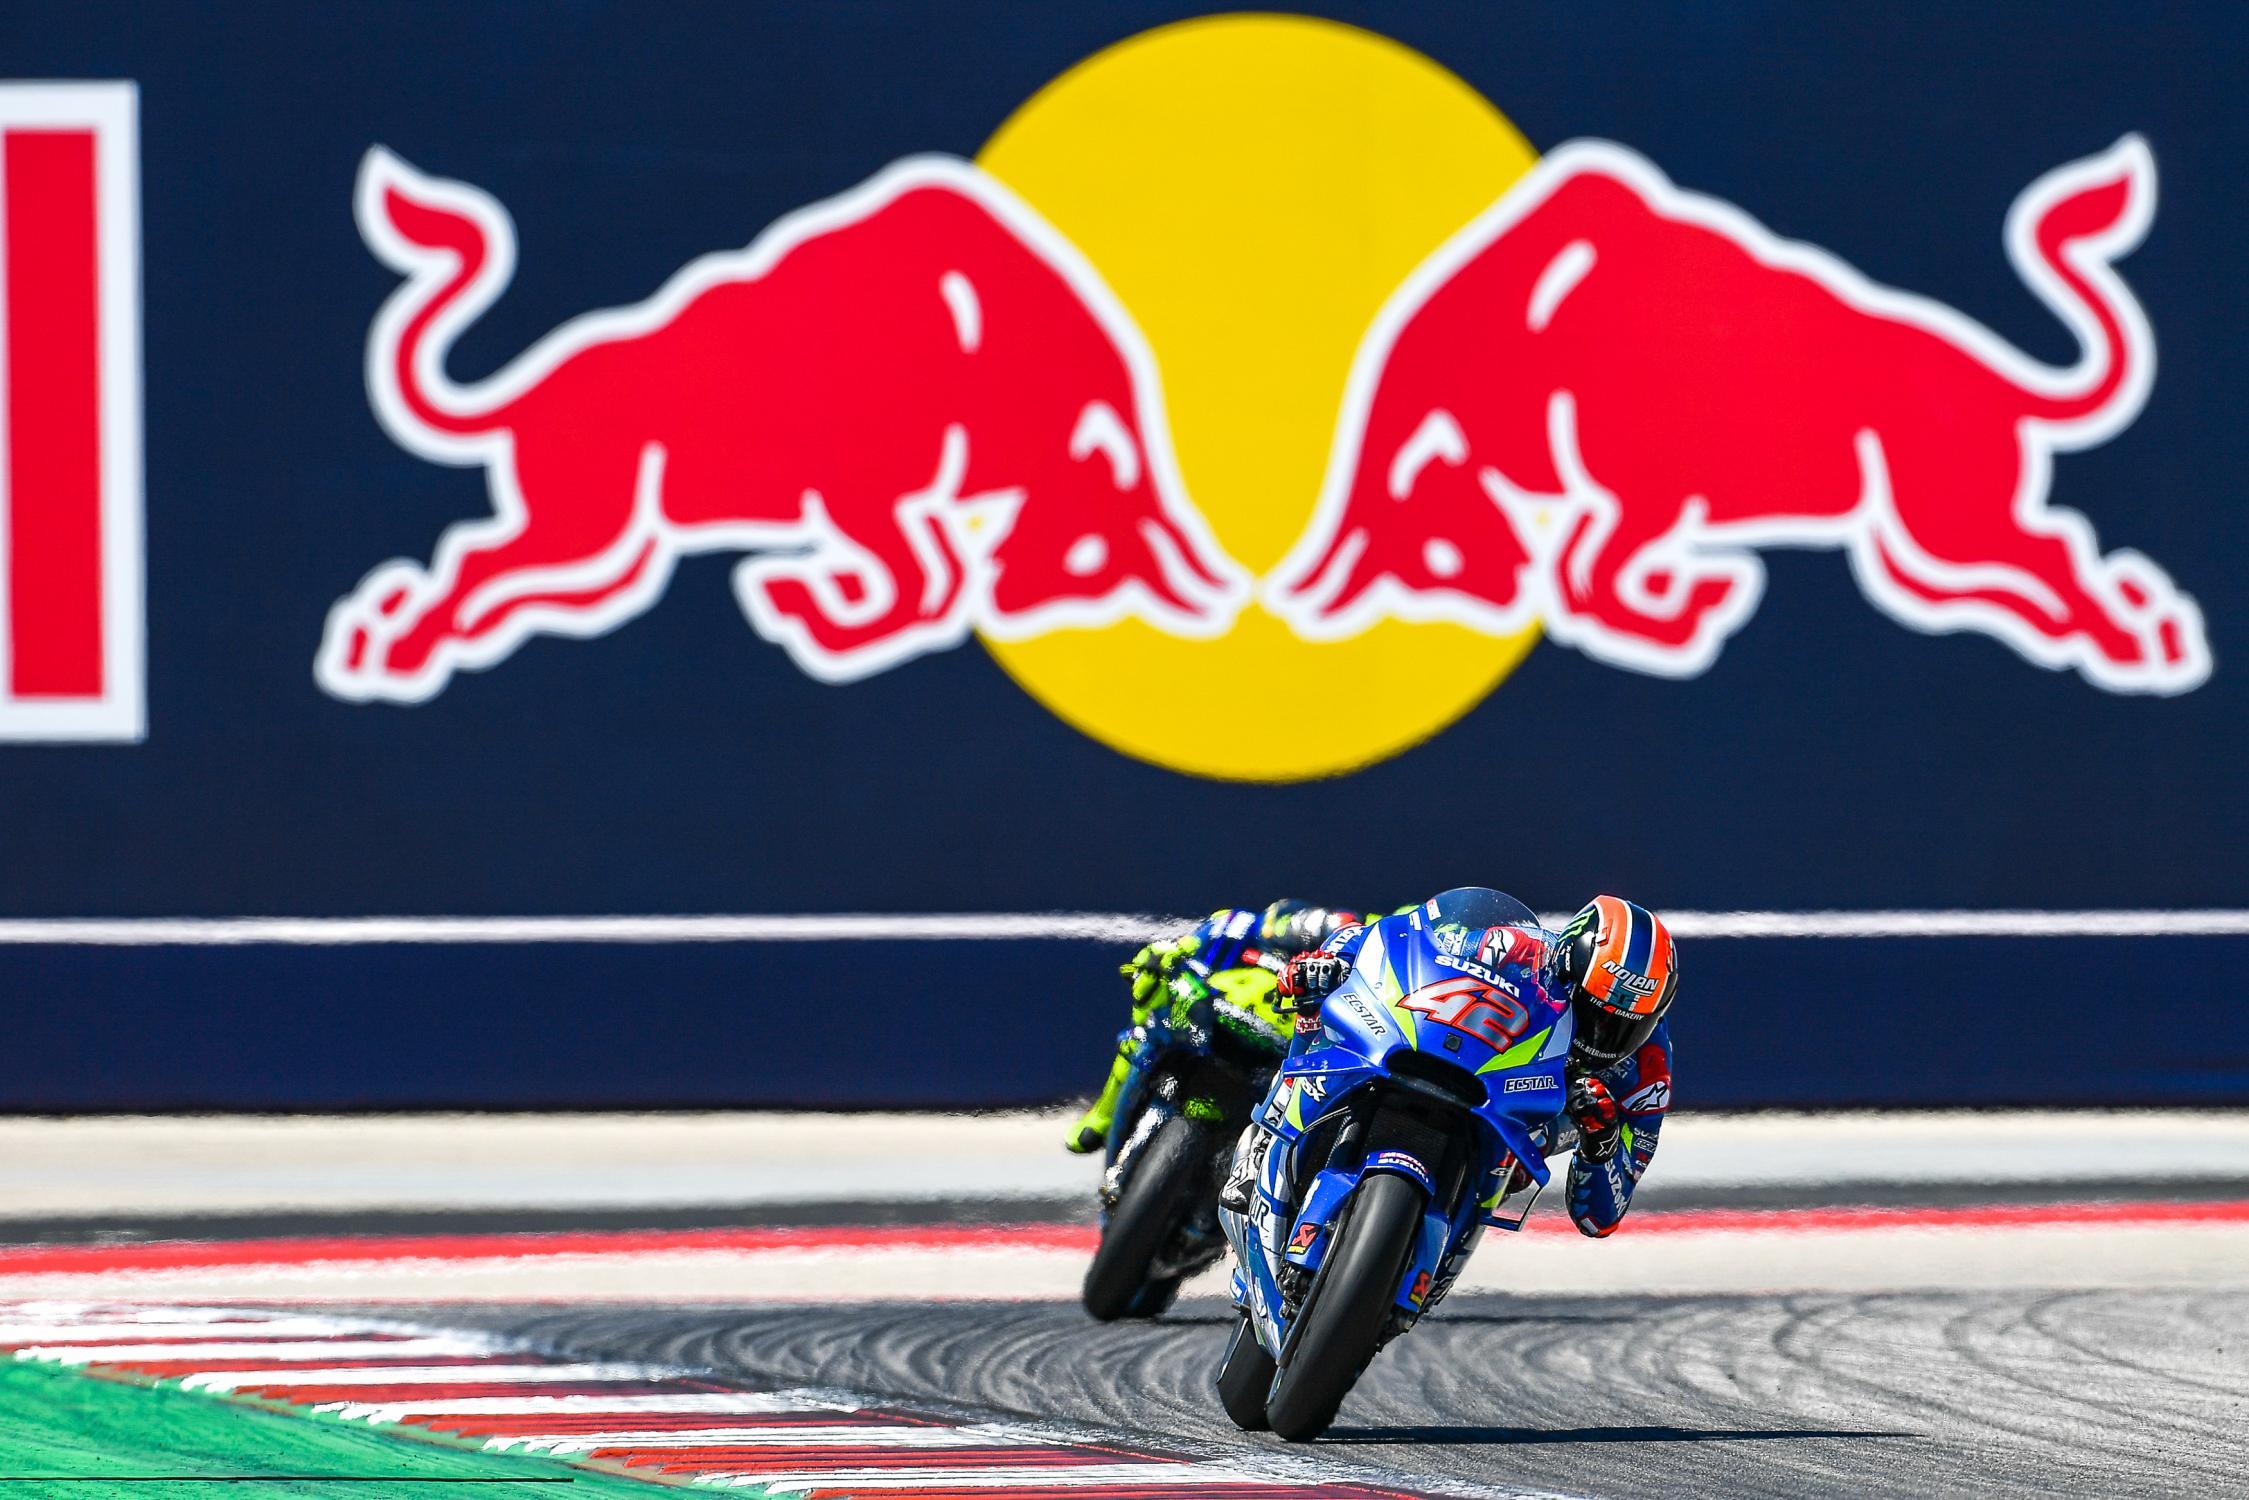 Empat Pebalap Incar Gelar Juara Dunia MotoGP 2019